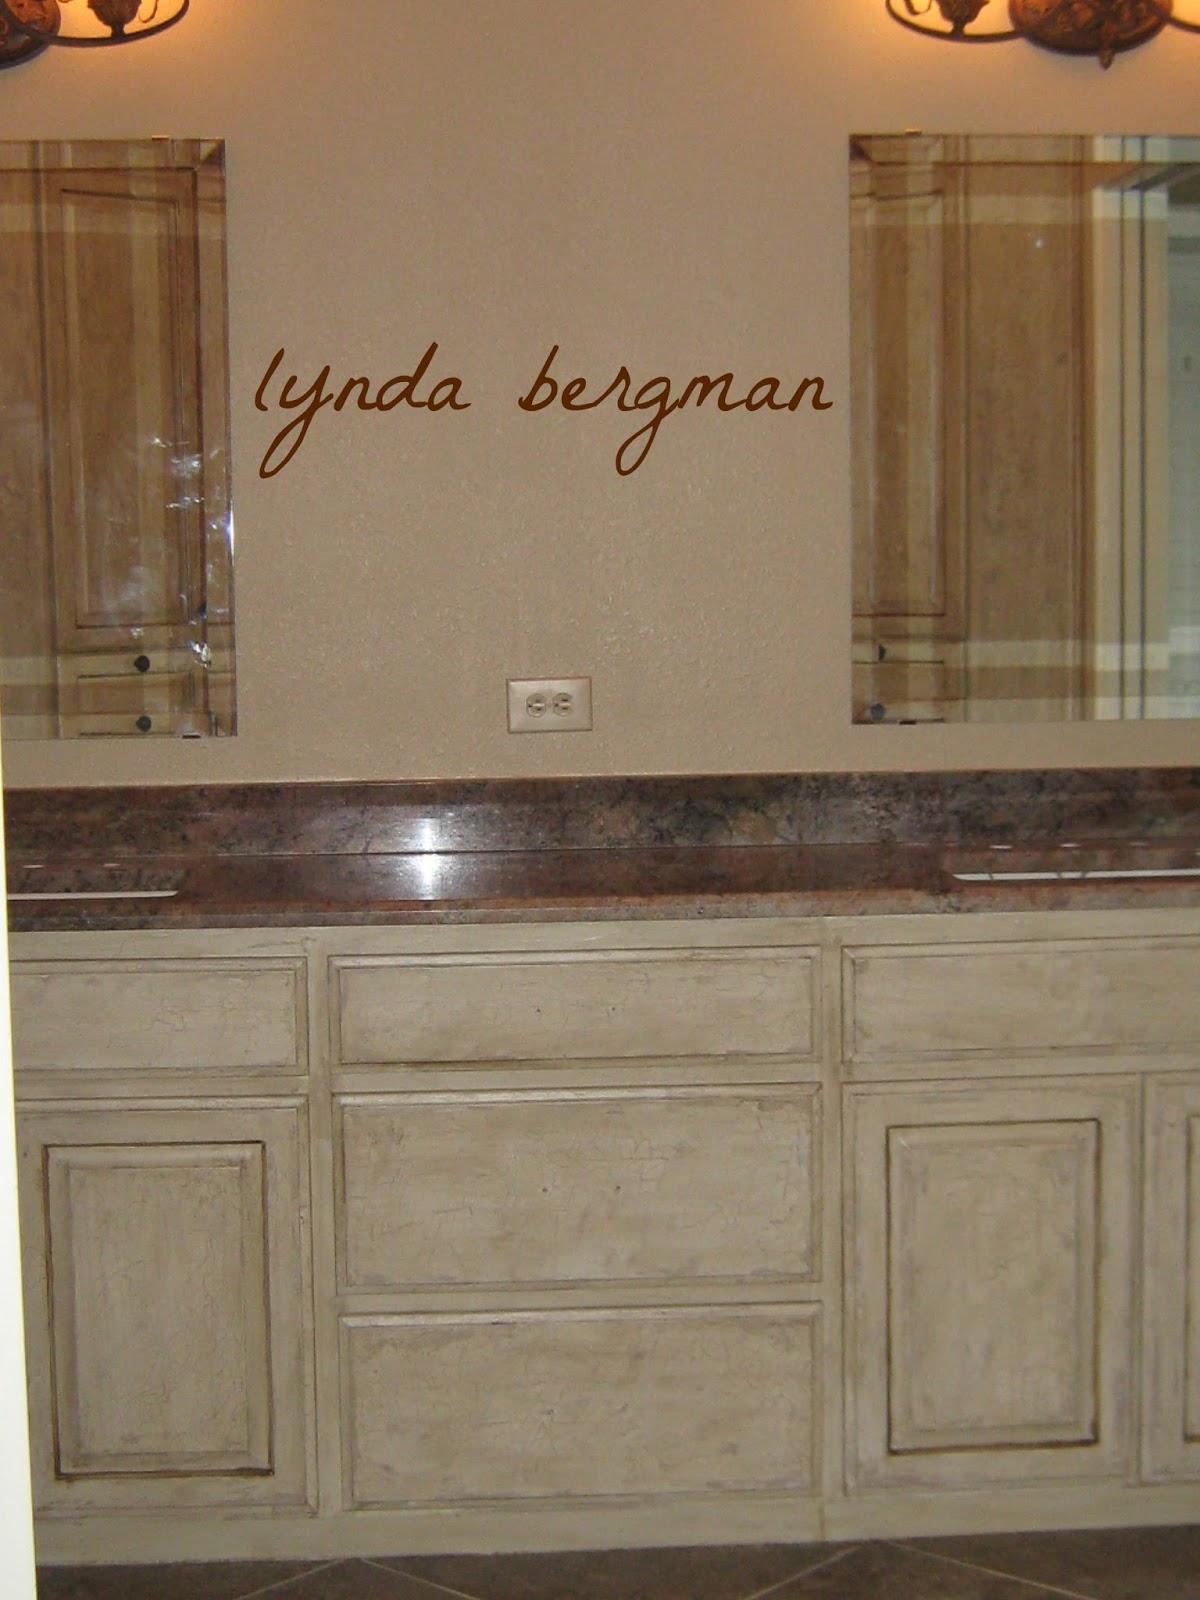 Lynda Bergman Decorative Artisan Distressed Faux Finish